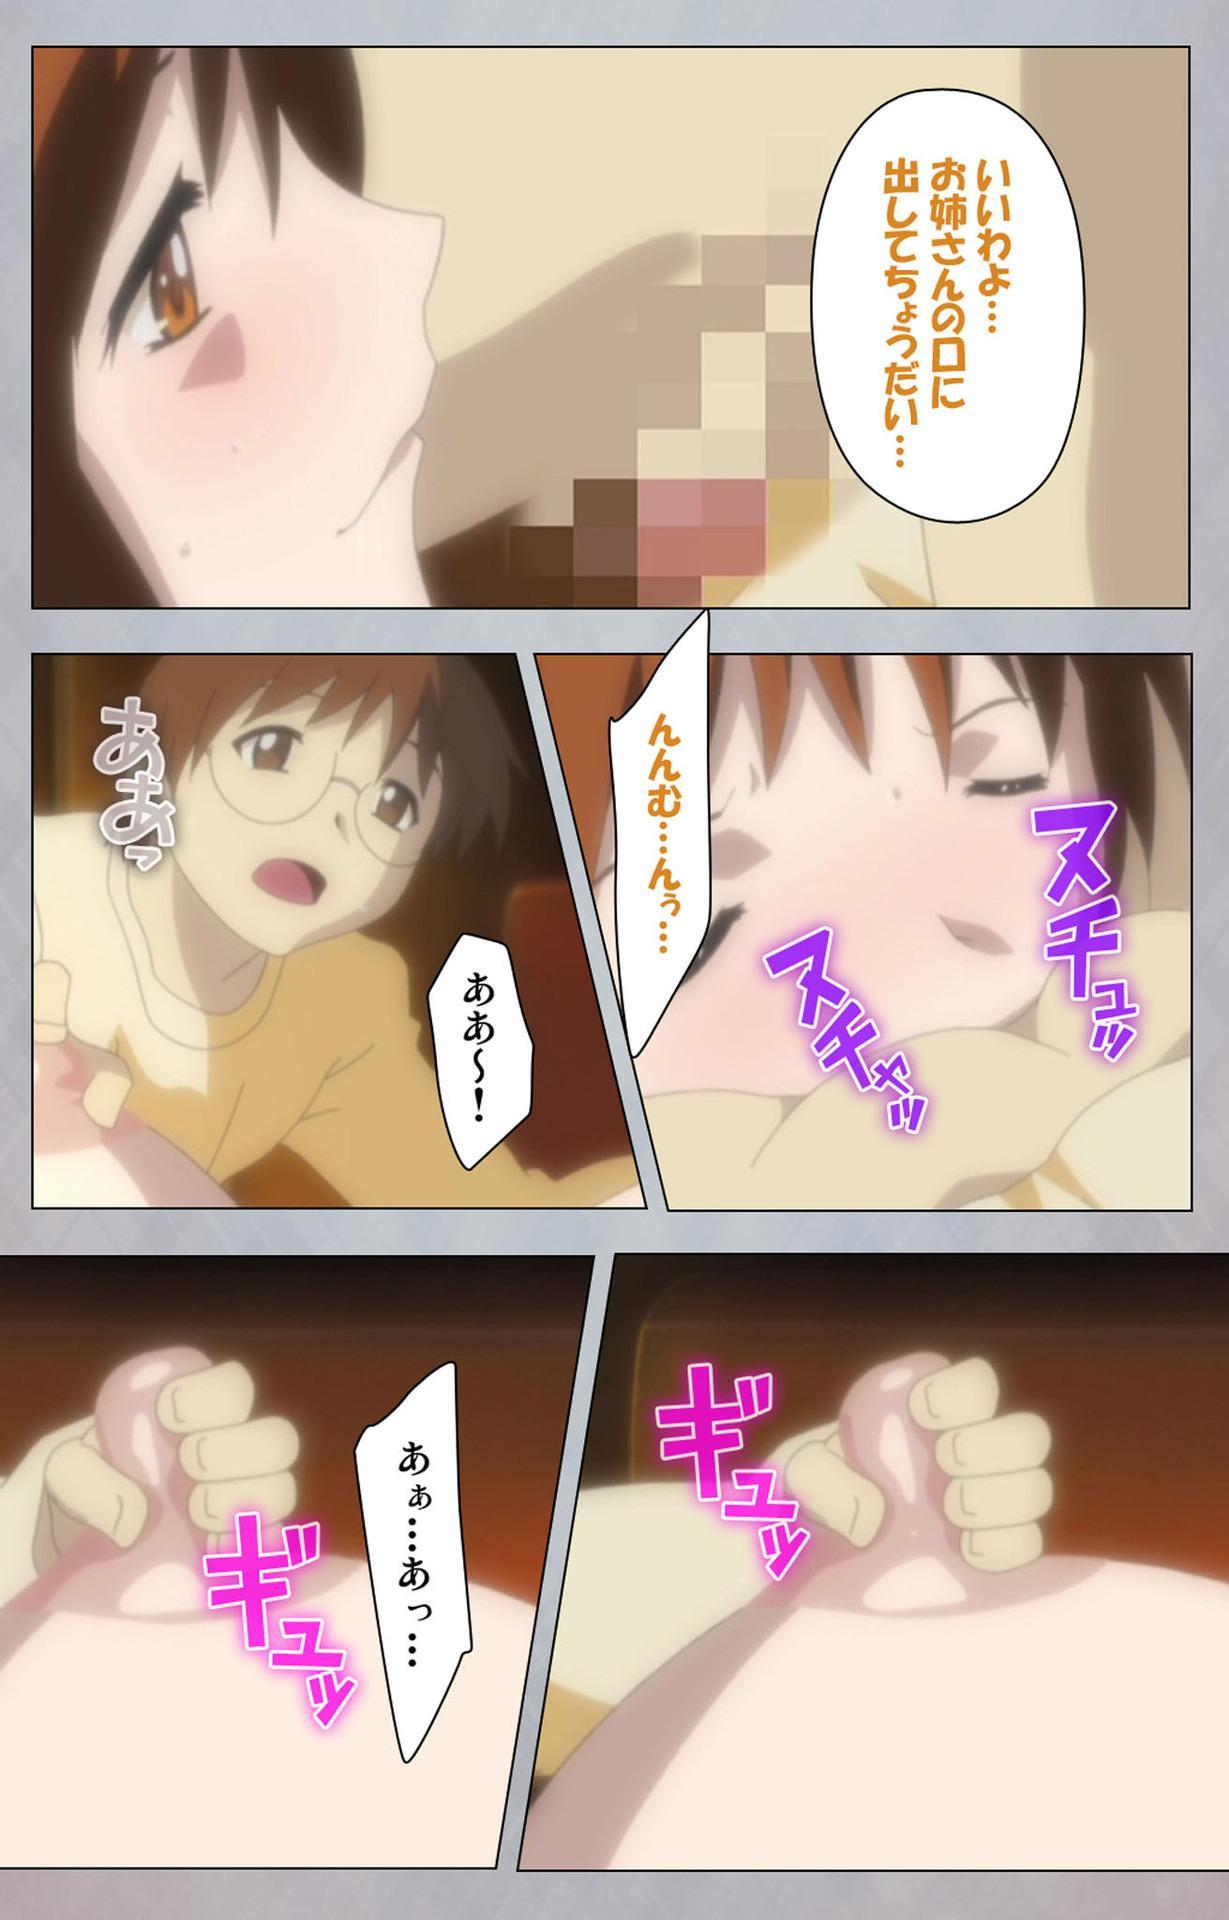 [Digital Works] [Full Color Seijin Ban] Sex Android ~Risou no Onna de Nuite yaru~ Kanzenban 96